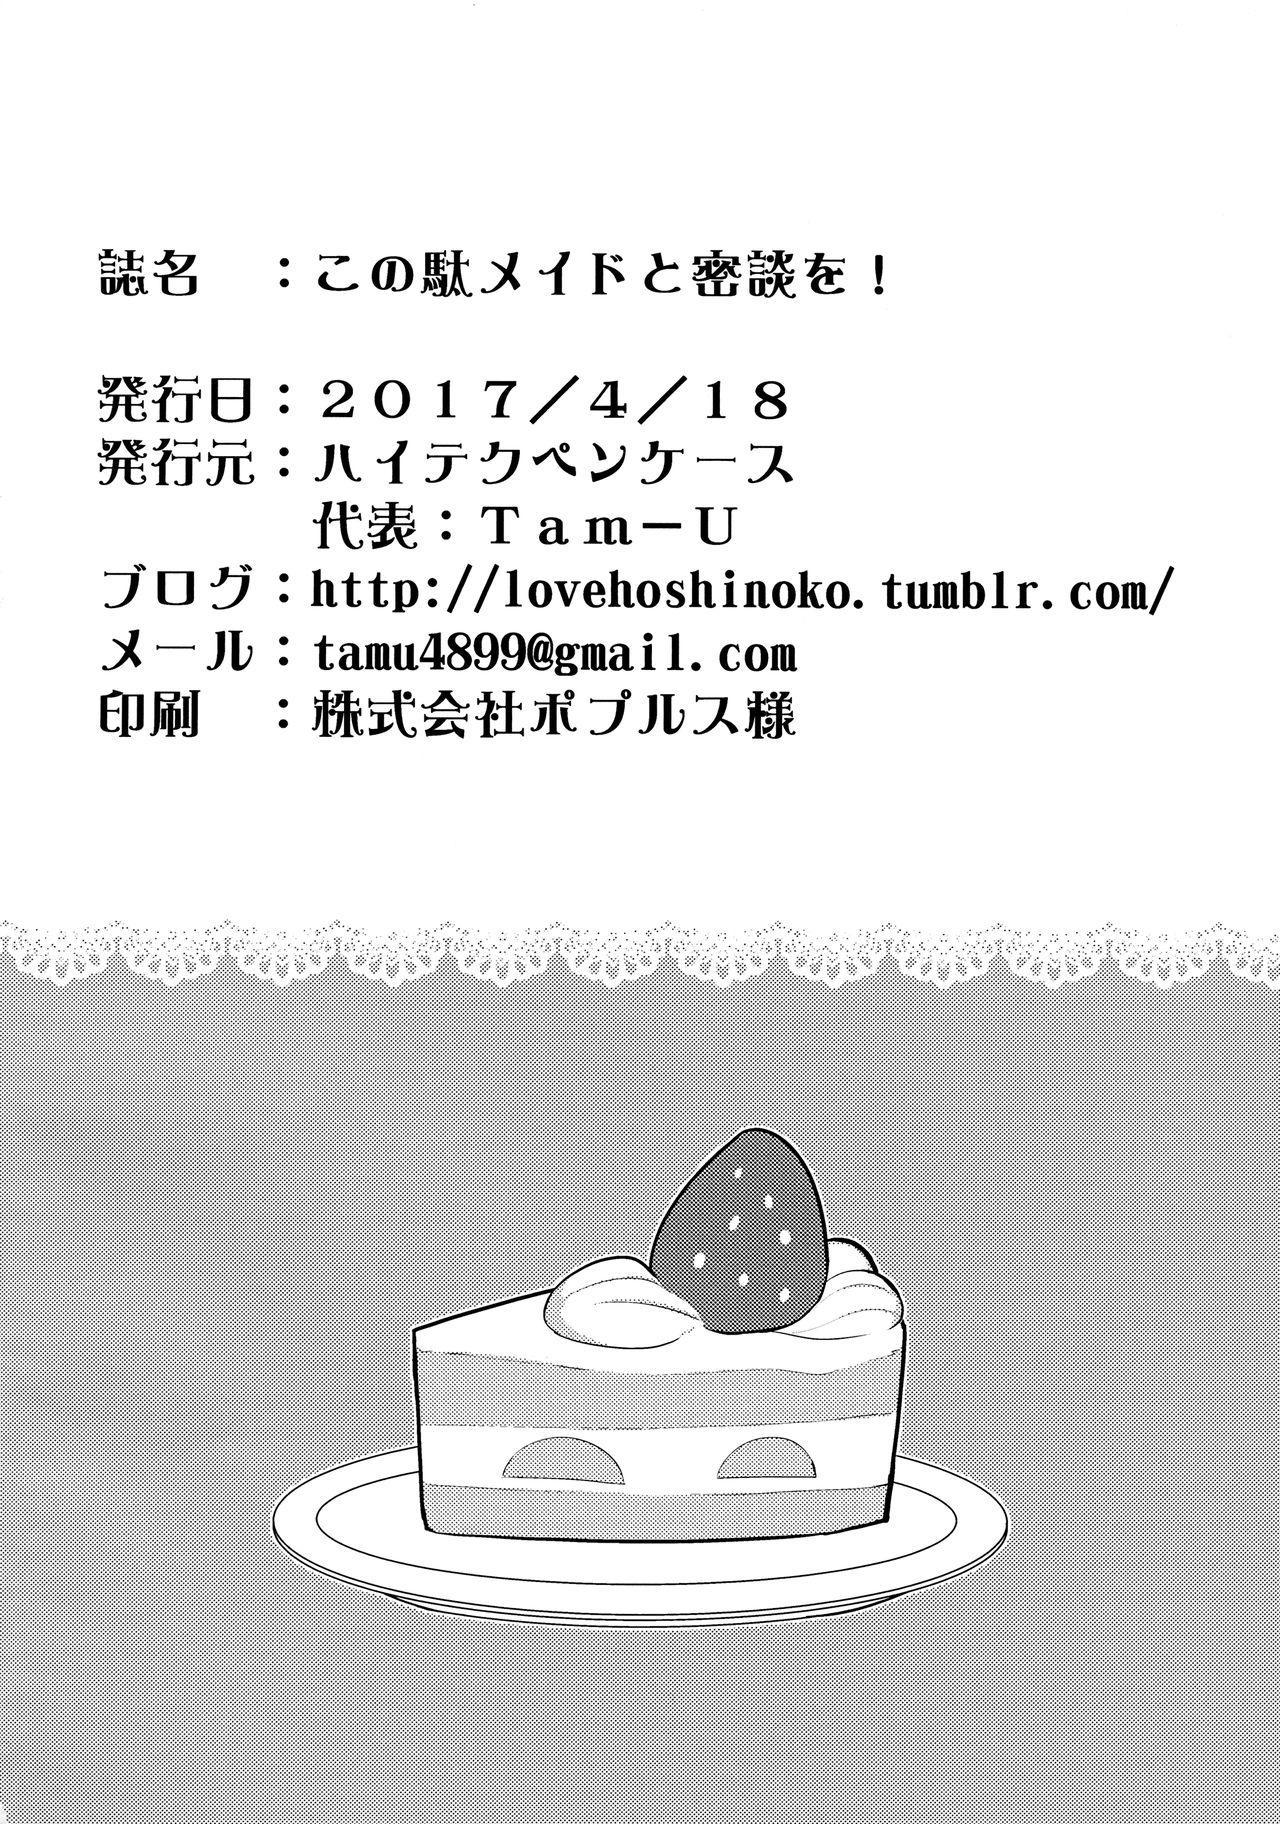 Kono Da-Maid to Mitsudan o! | A Private Discussion with this Useless Maid! 24